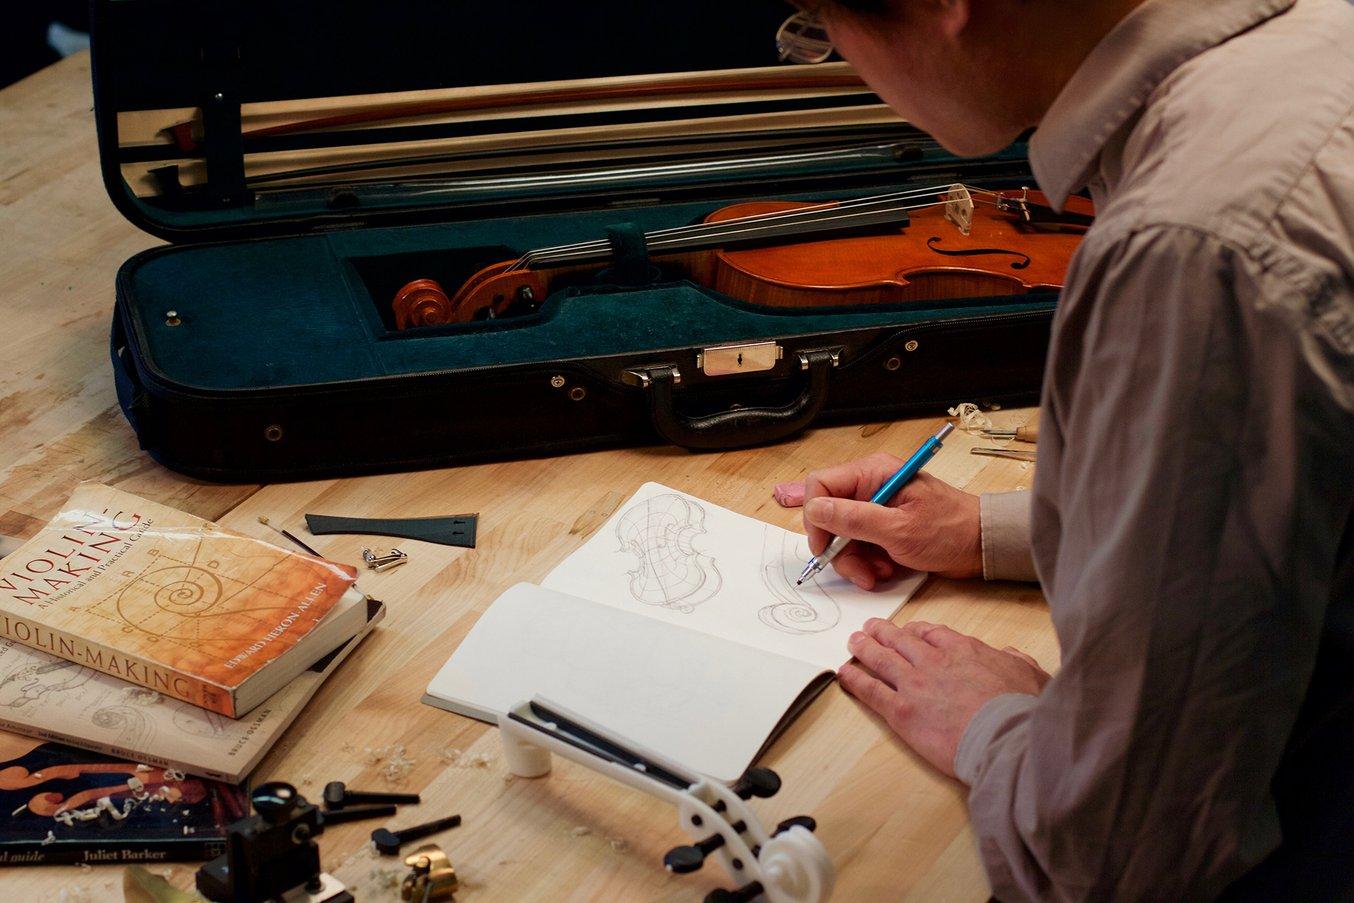 Designing a 3d printed violin